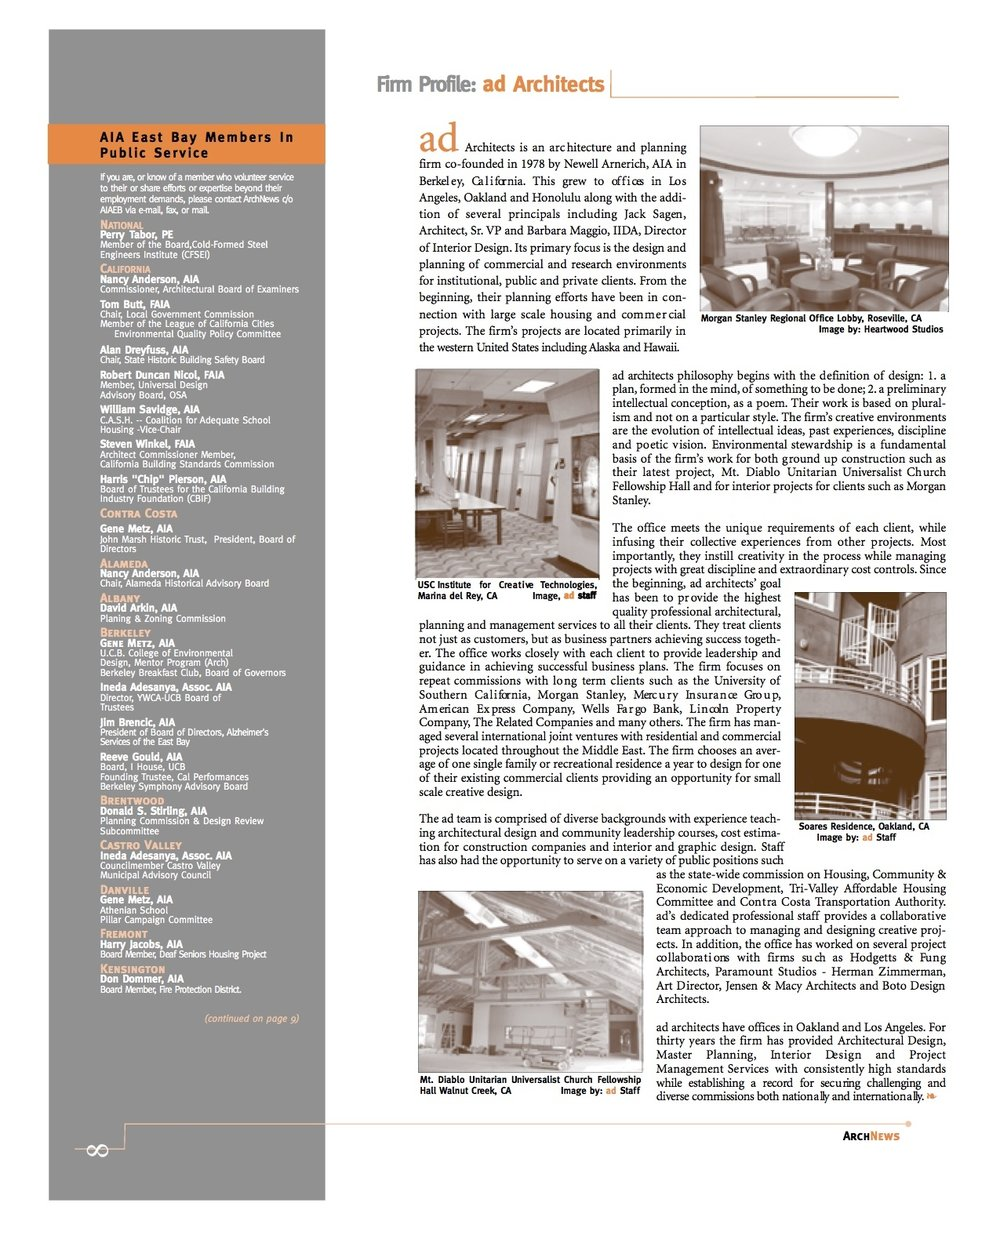 AD Firm Profile Jan09ARCHnews 1.jpg